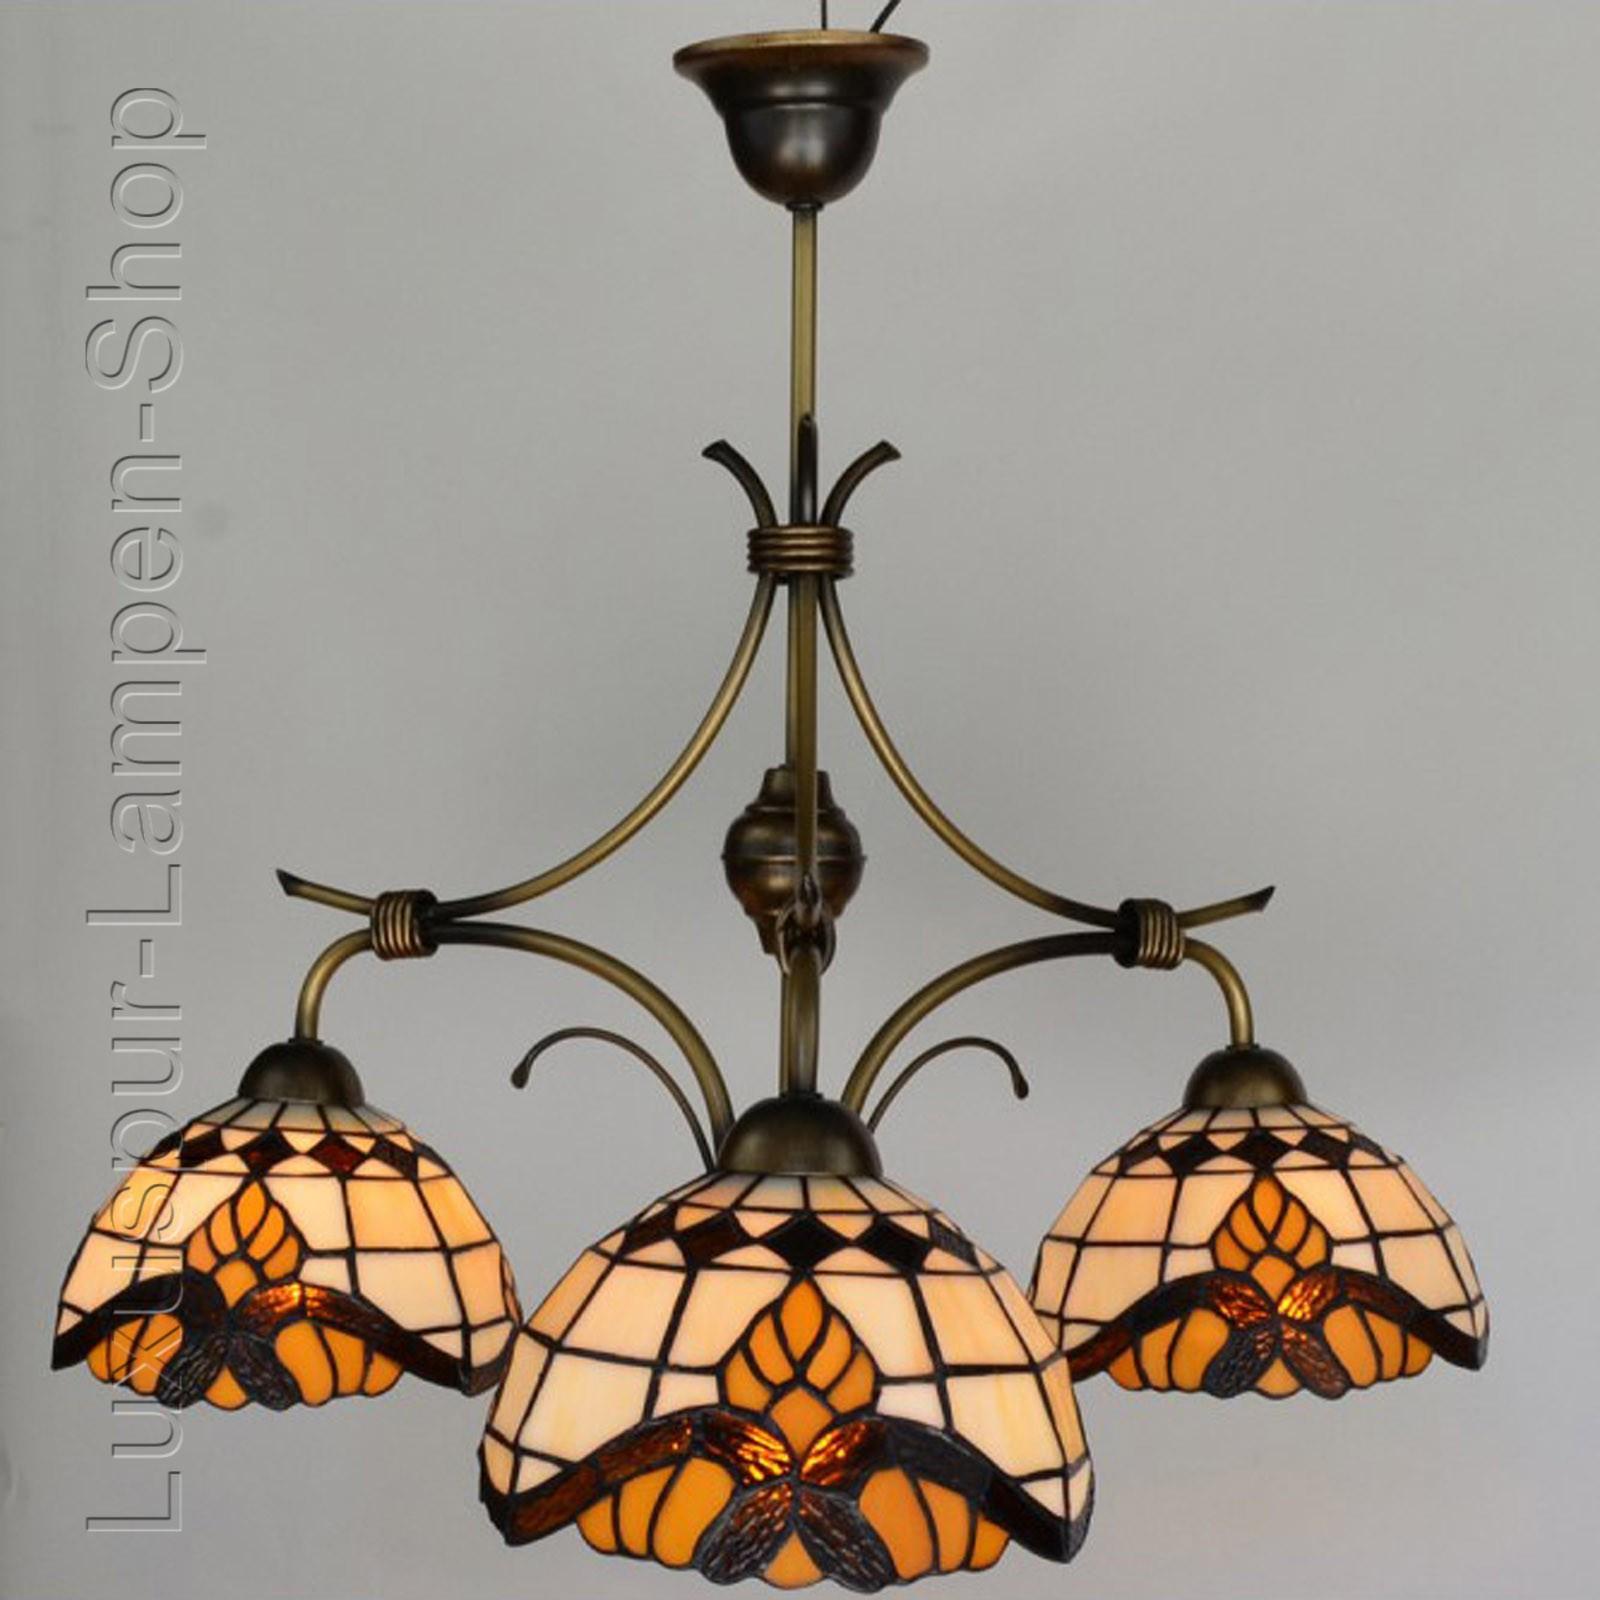 Hängende Deckenlampe Im Tiffany Stil U0026quot;Antik Barocku0026quot;   3flammige  Leuchte U2013 Bild 1